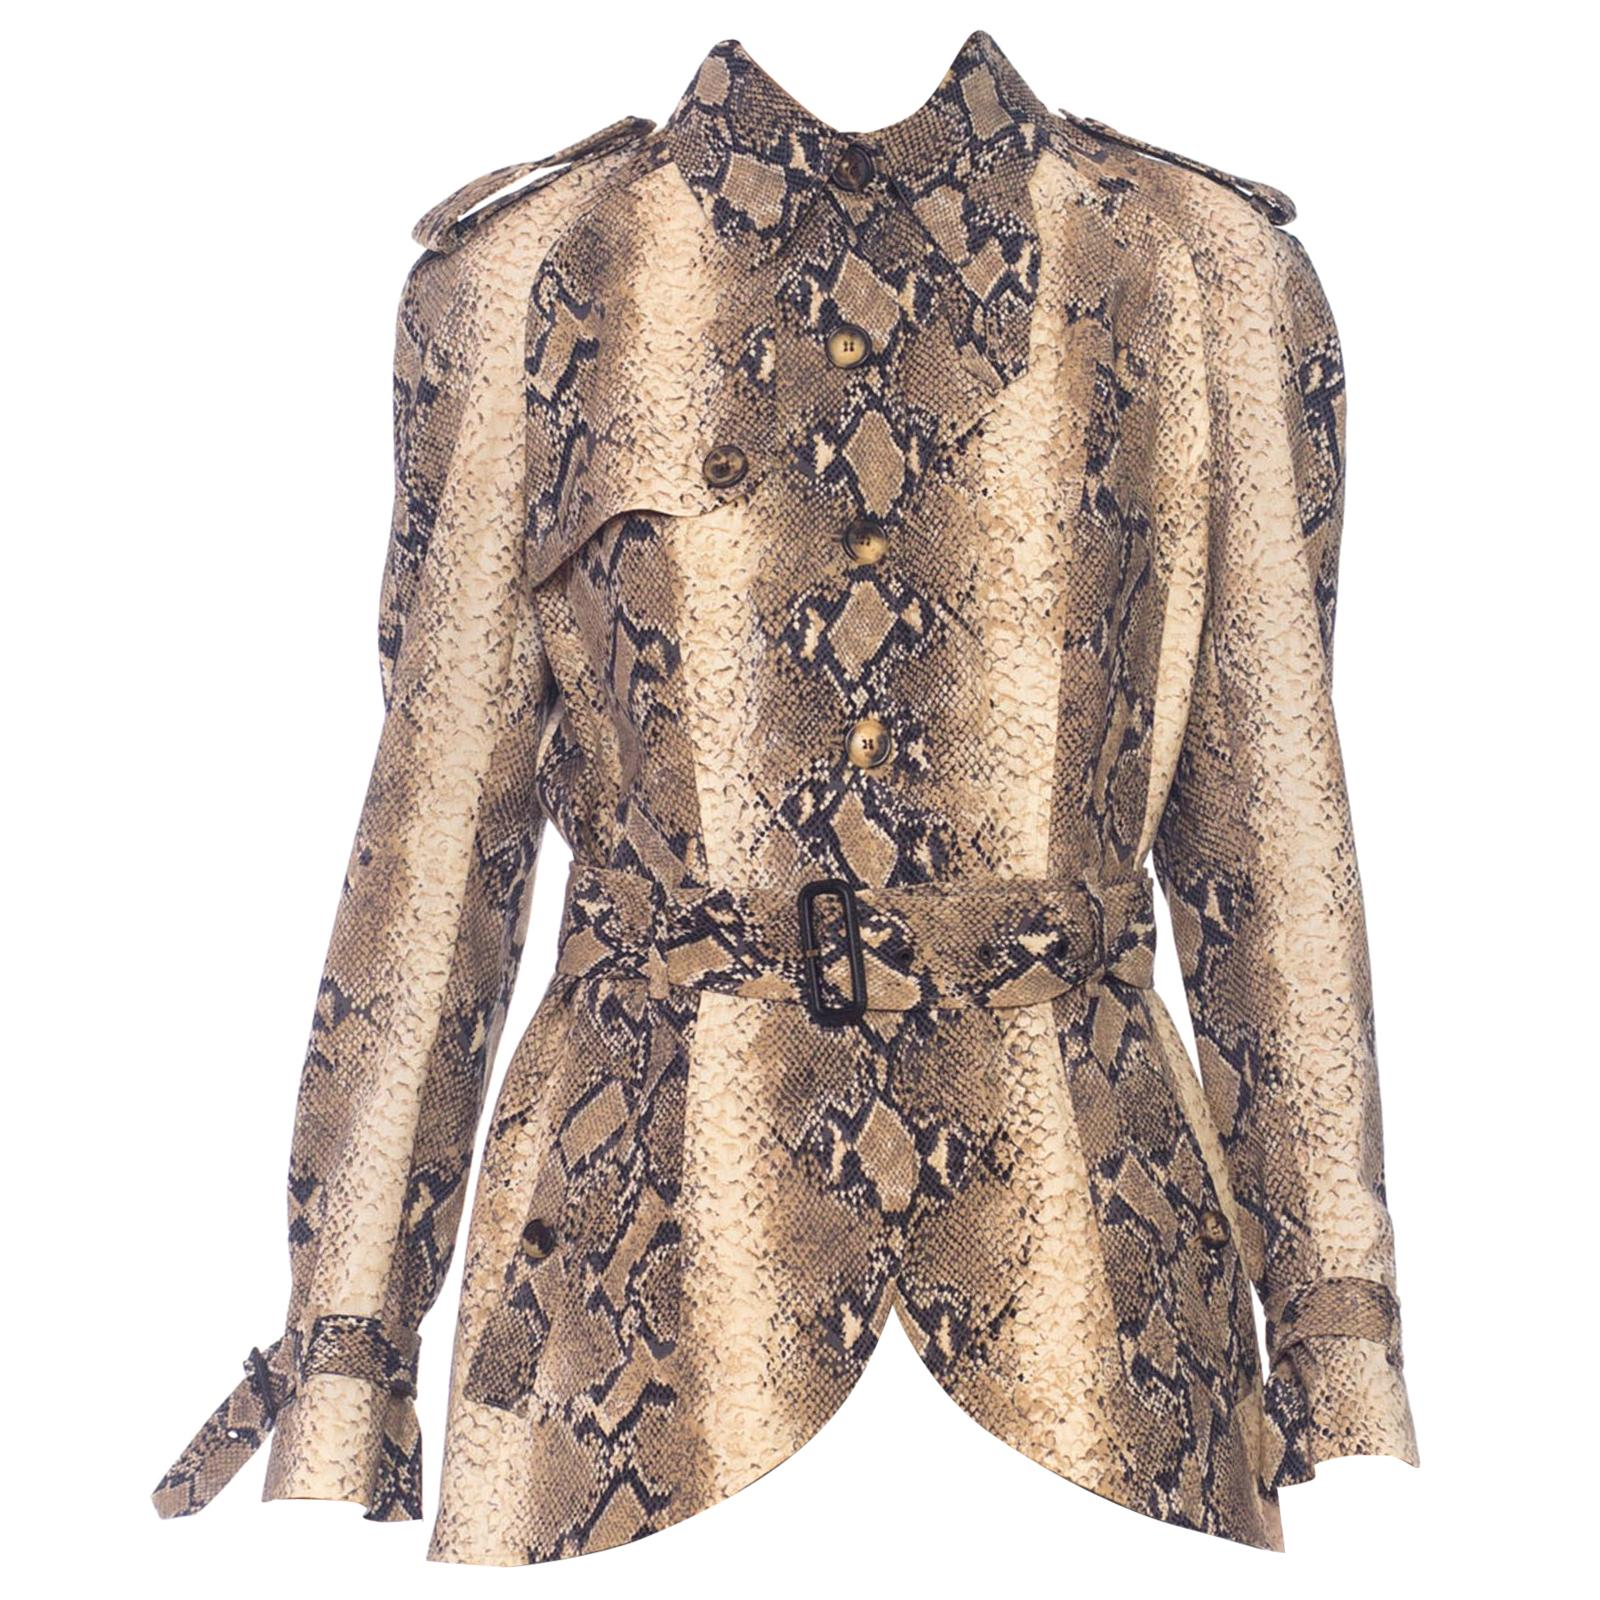 1990S JOHN GALLIANO Deadstock NWT Snake Snakeskin Print Light-Weight Wool Jacket